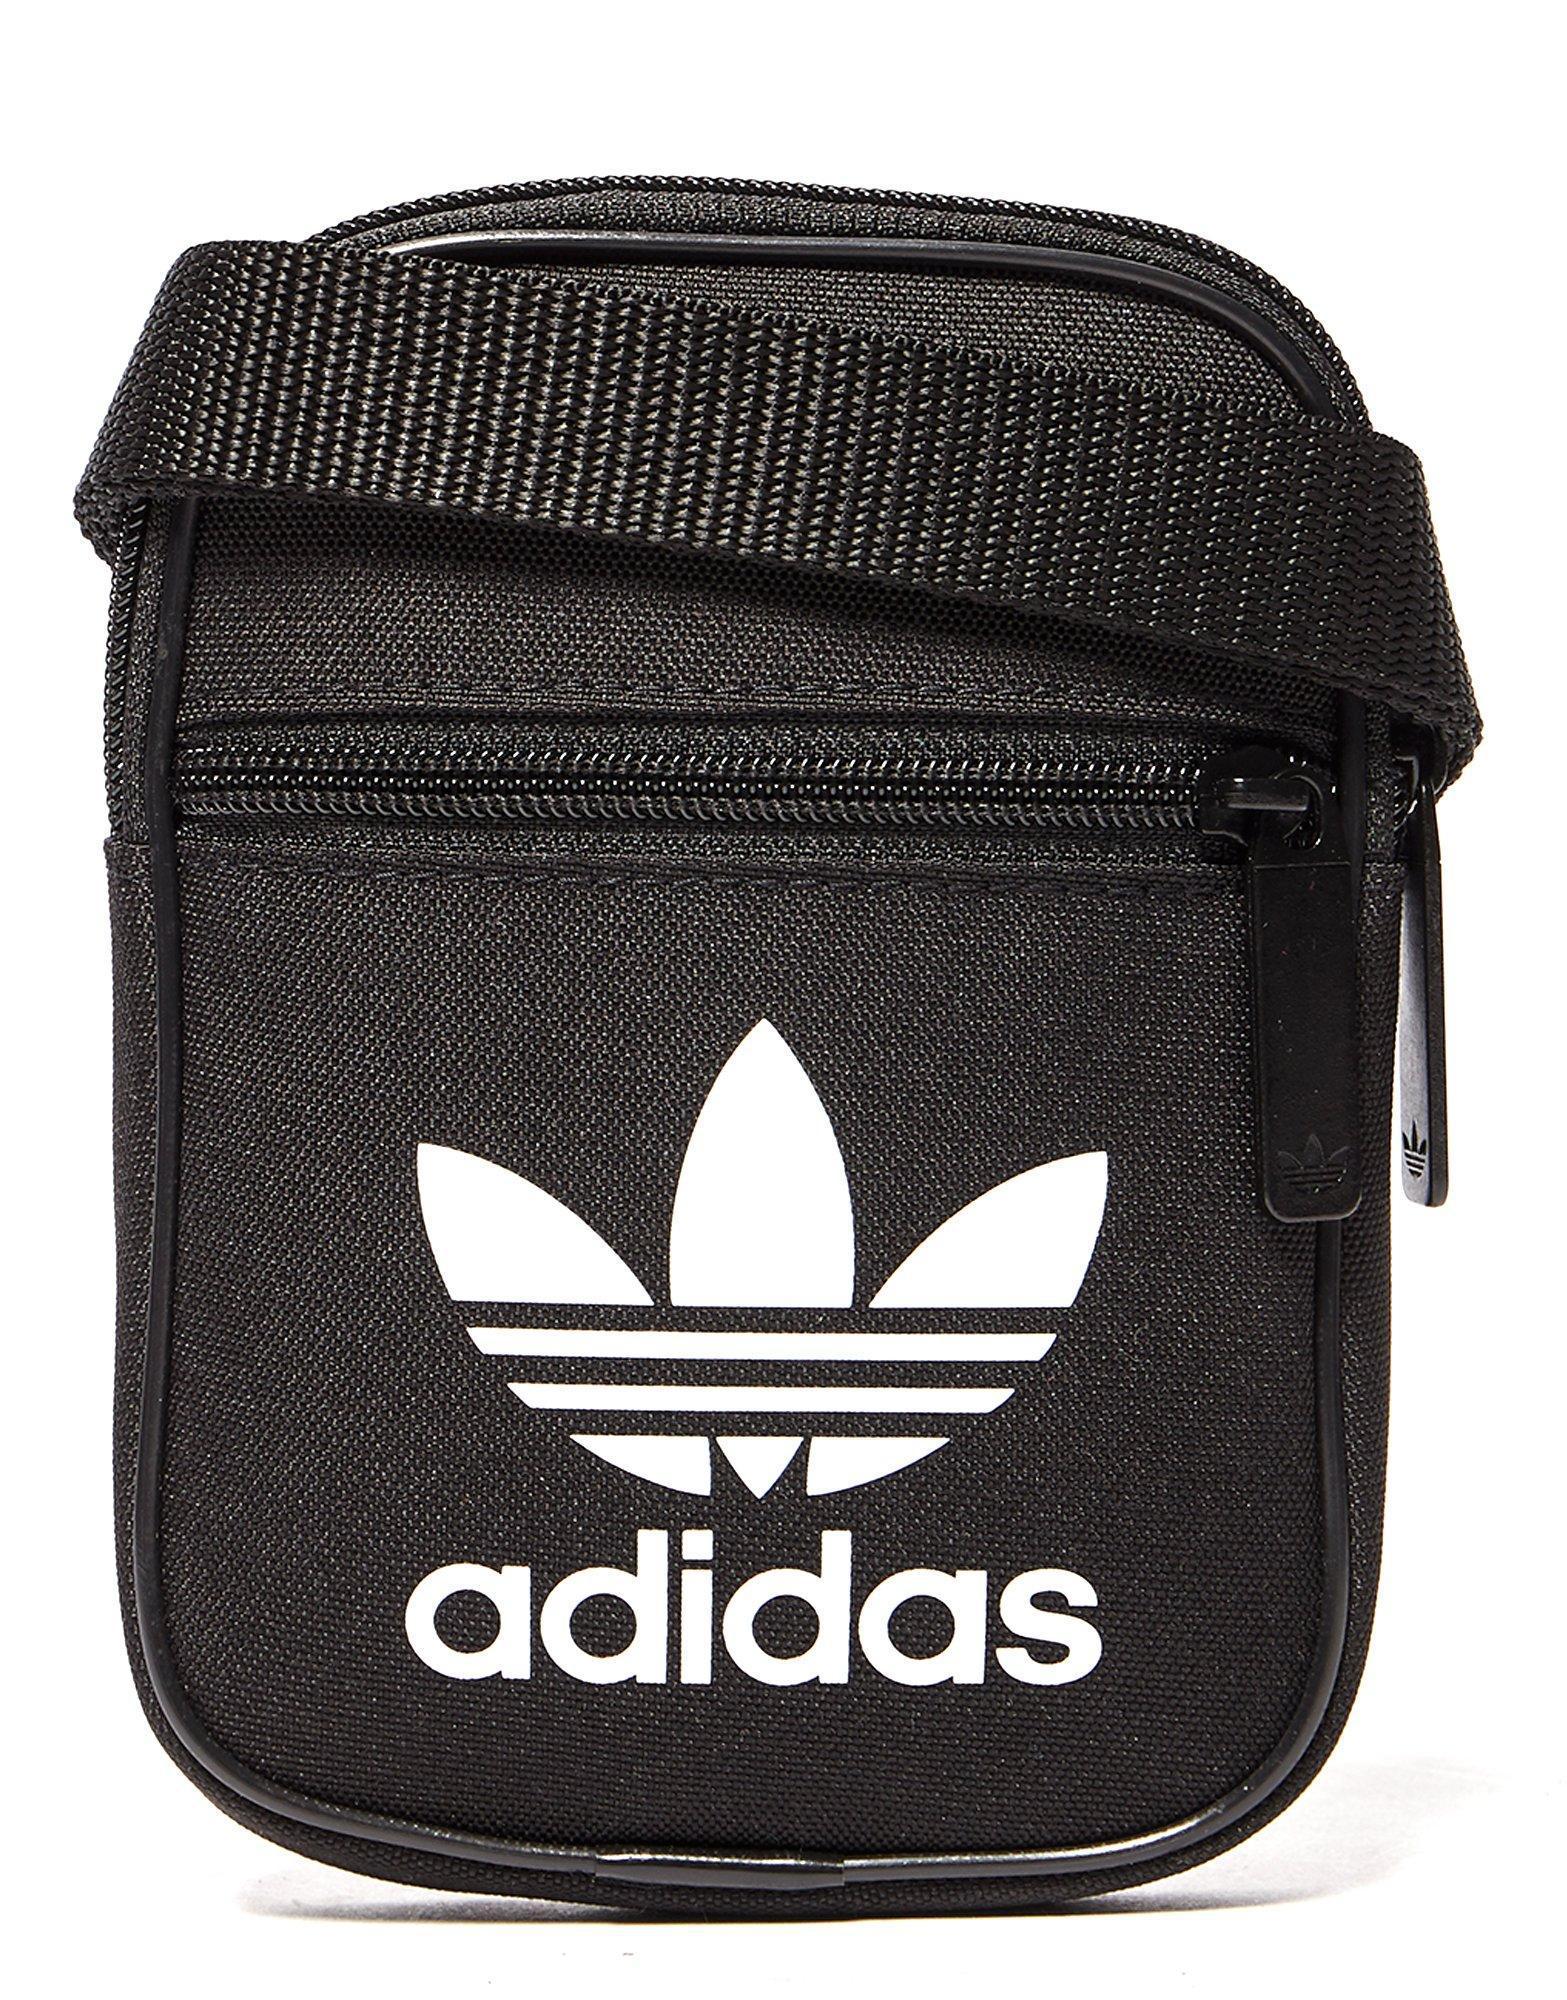 adidas Originals. Men's Black Festival Bag